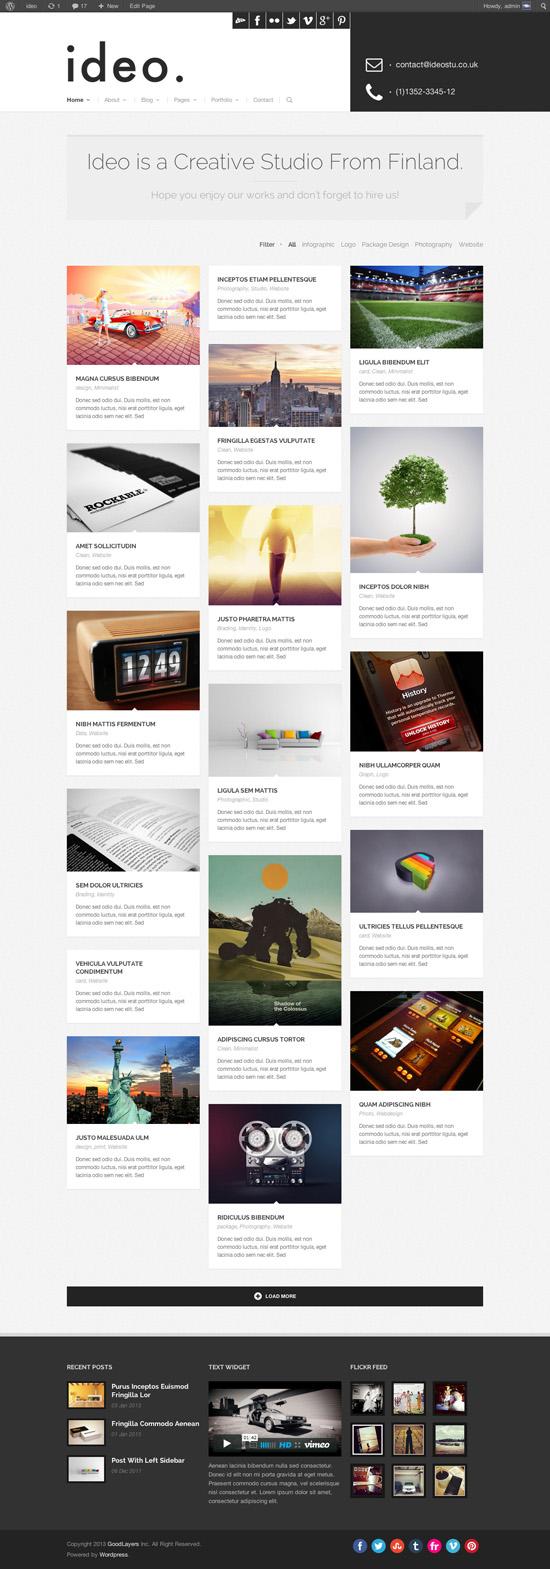 ideo - Minimalistic WordPress Portfolio Theme